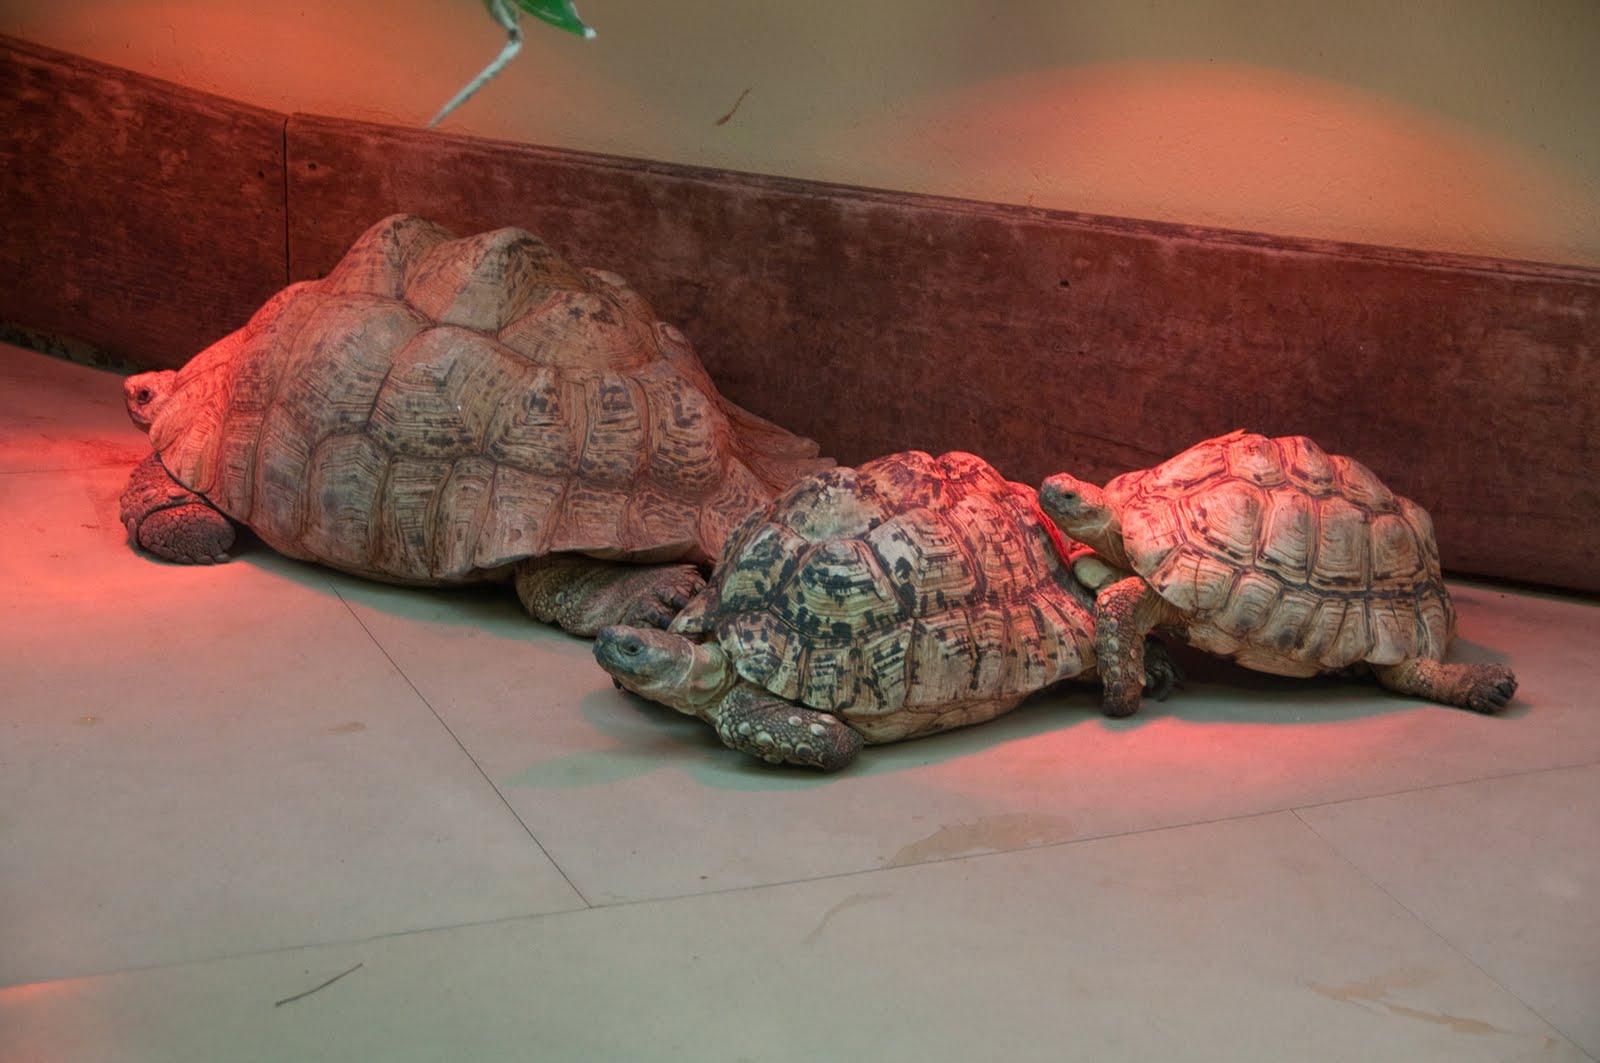 marys land turtles adventures in turtlesitting. Black Bedroom Furniture Sets. Home Design Ideas